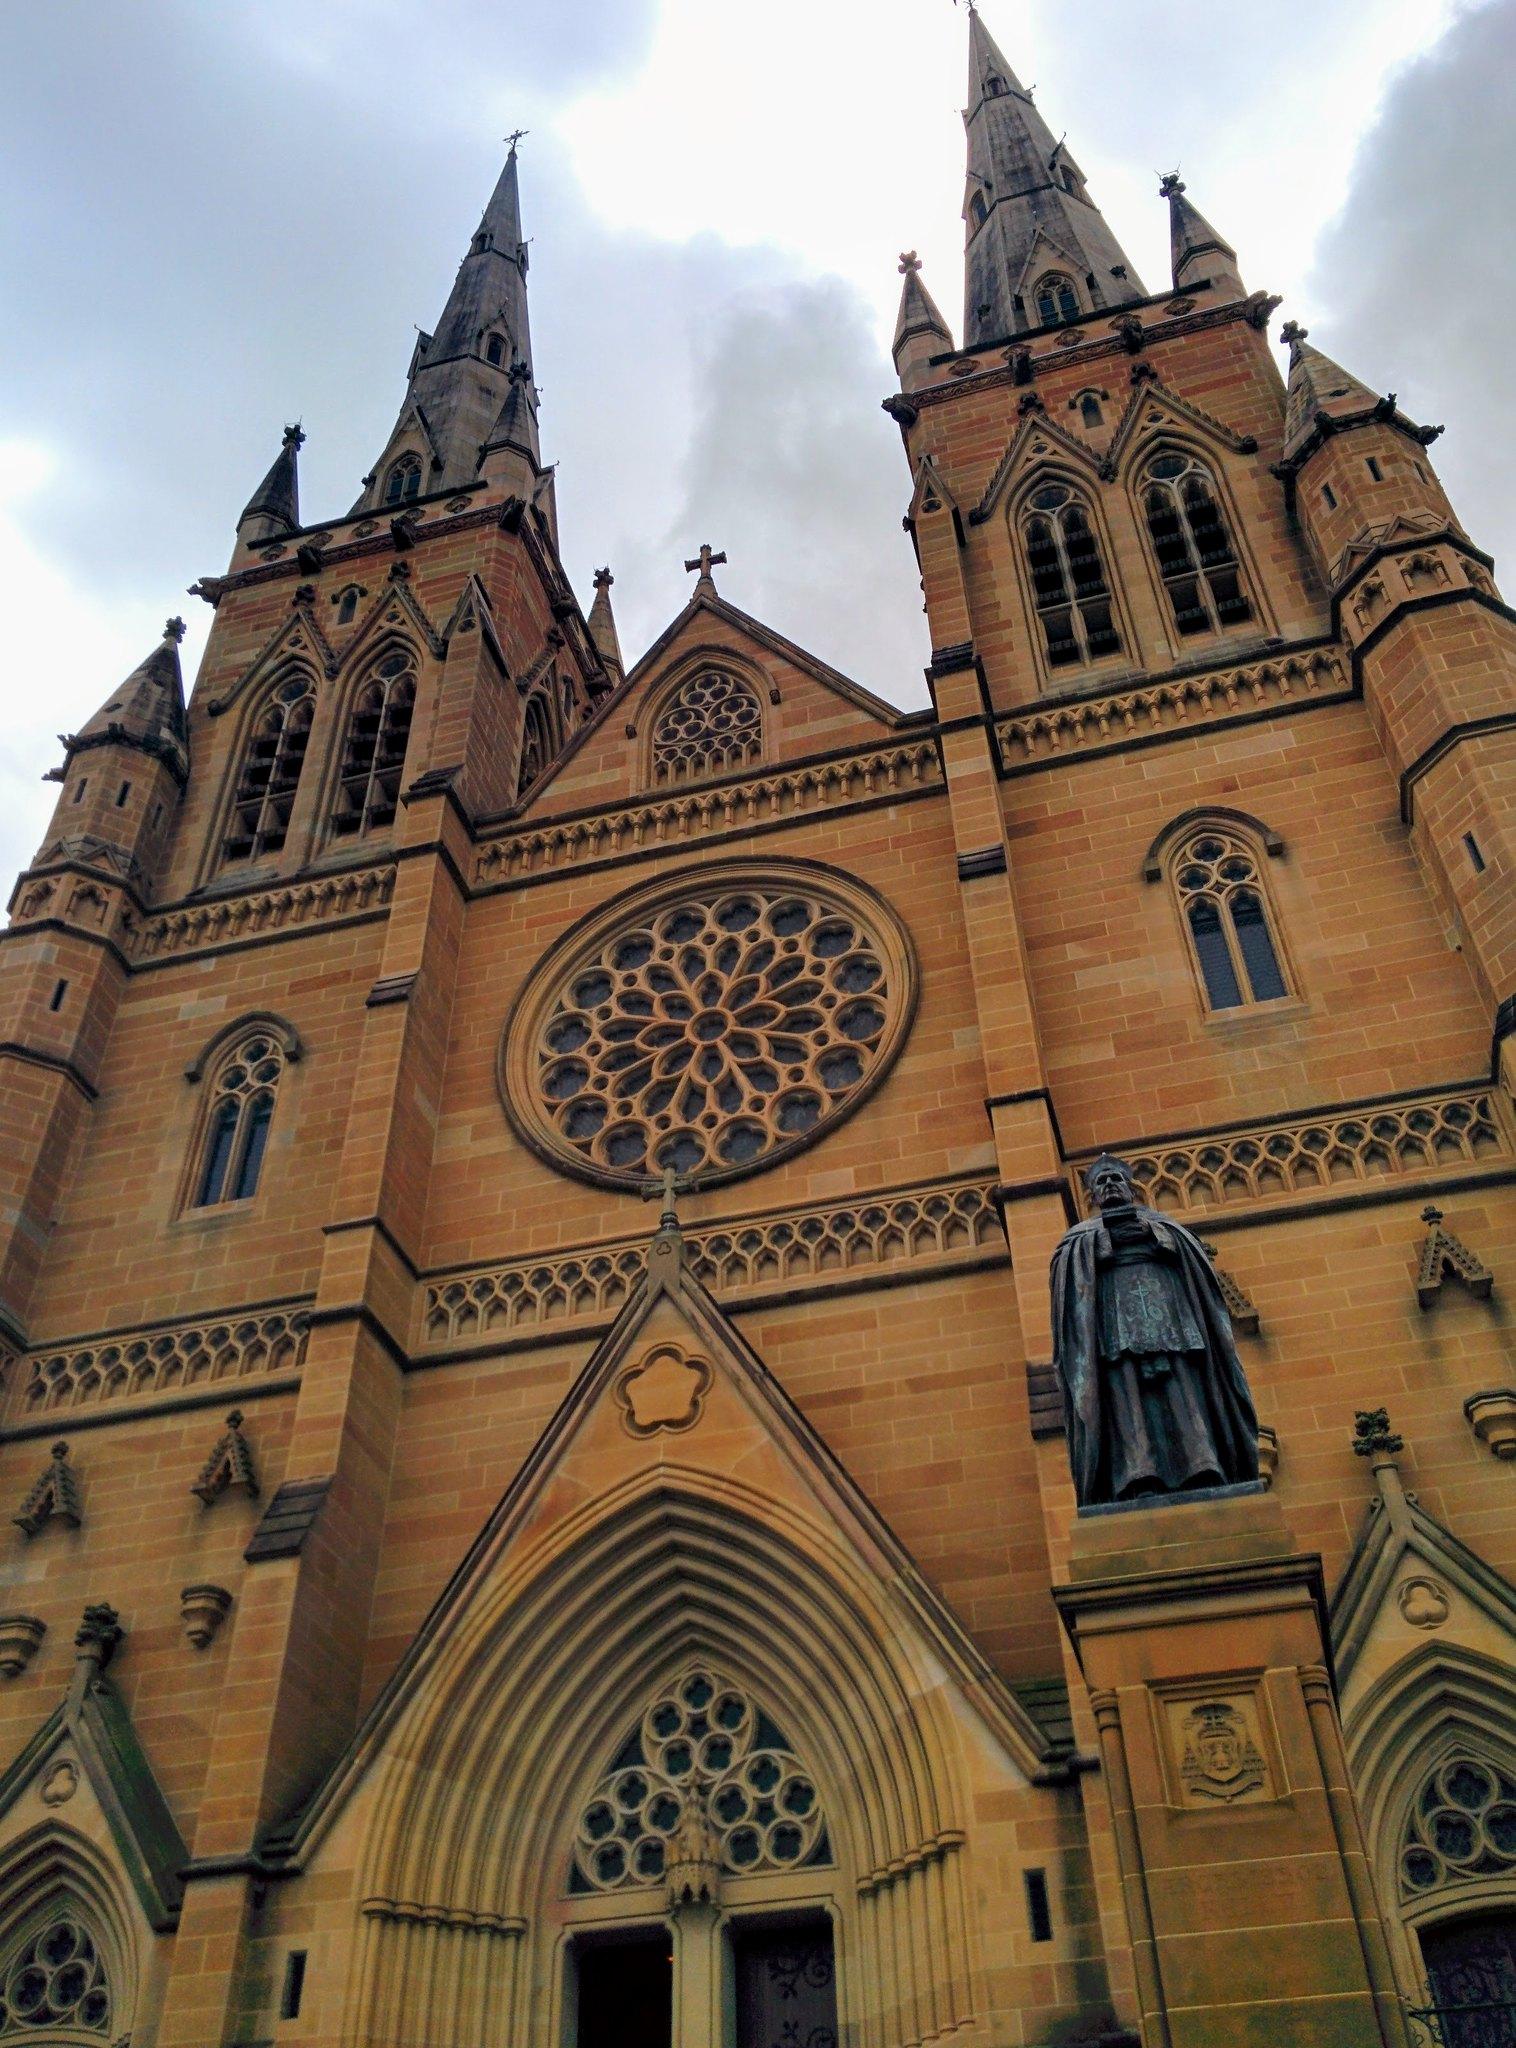 A large, ornate church